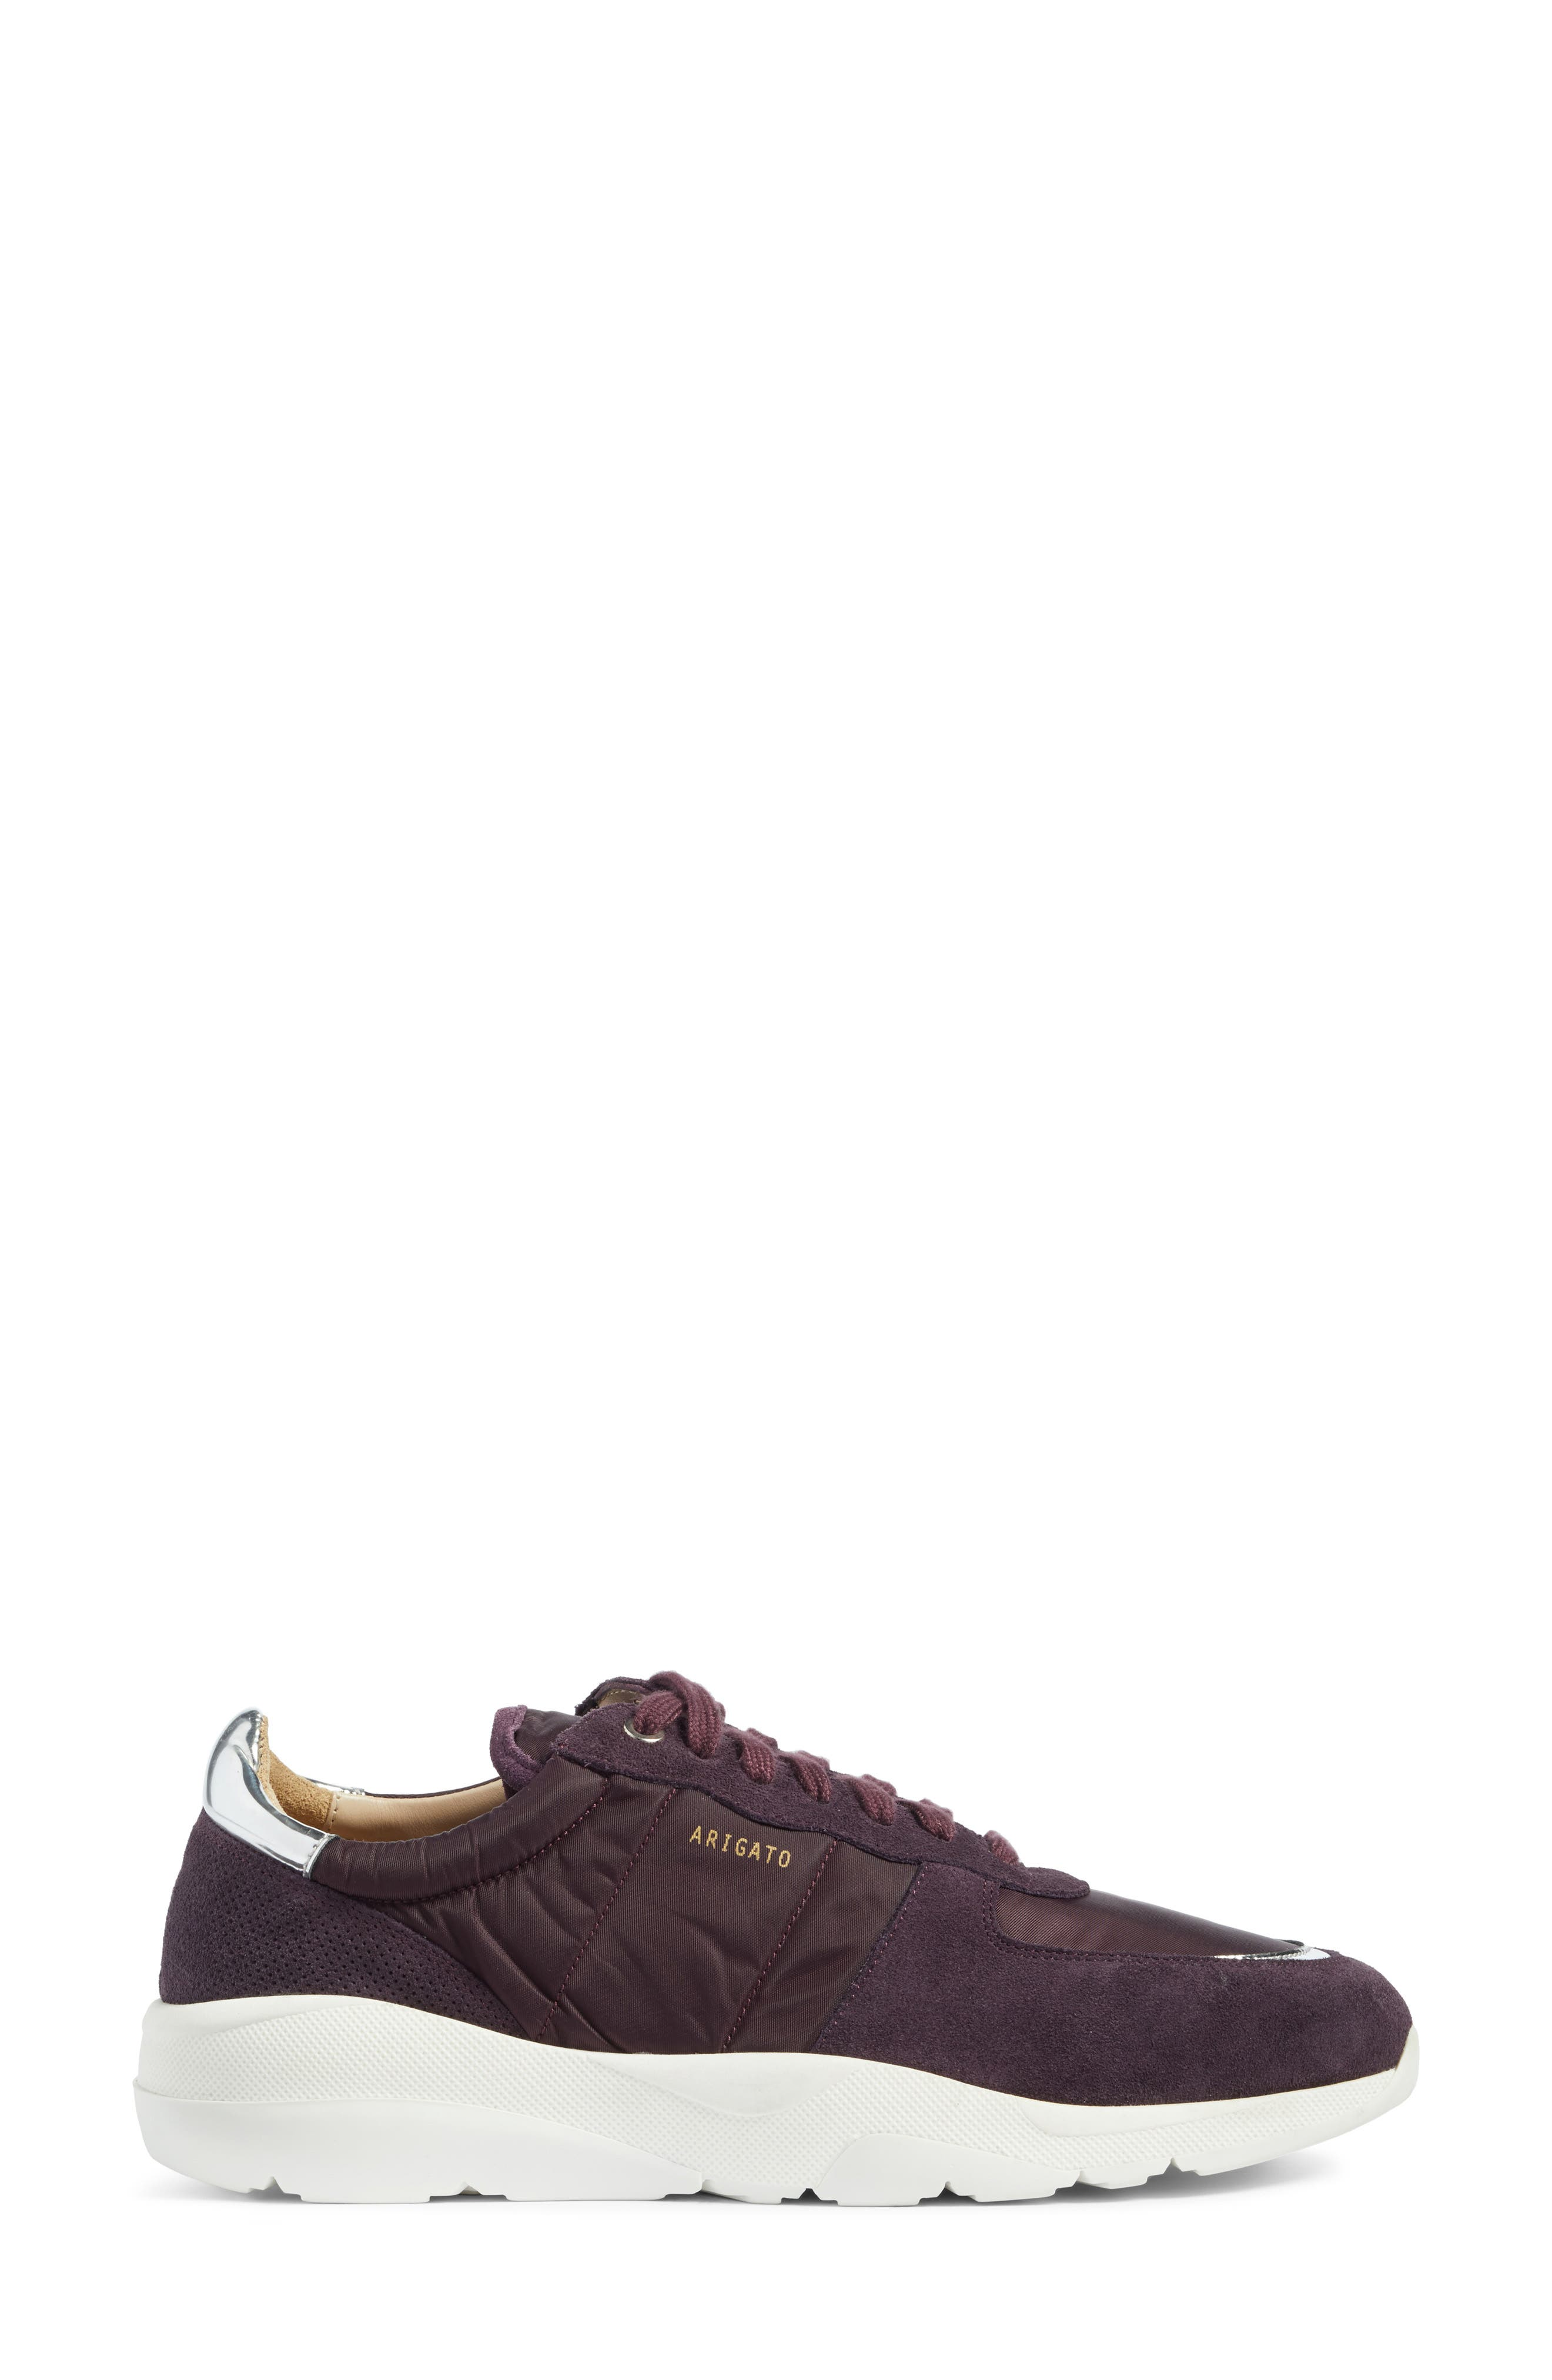 Geo Sneaker,                             Alternate thumbnail 3, color,                             500